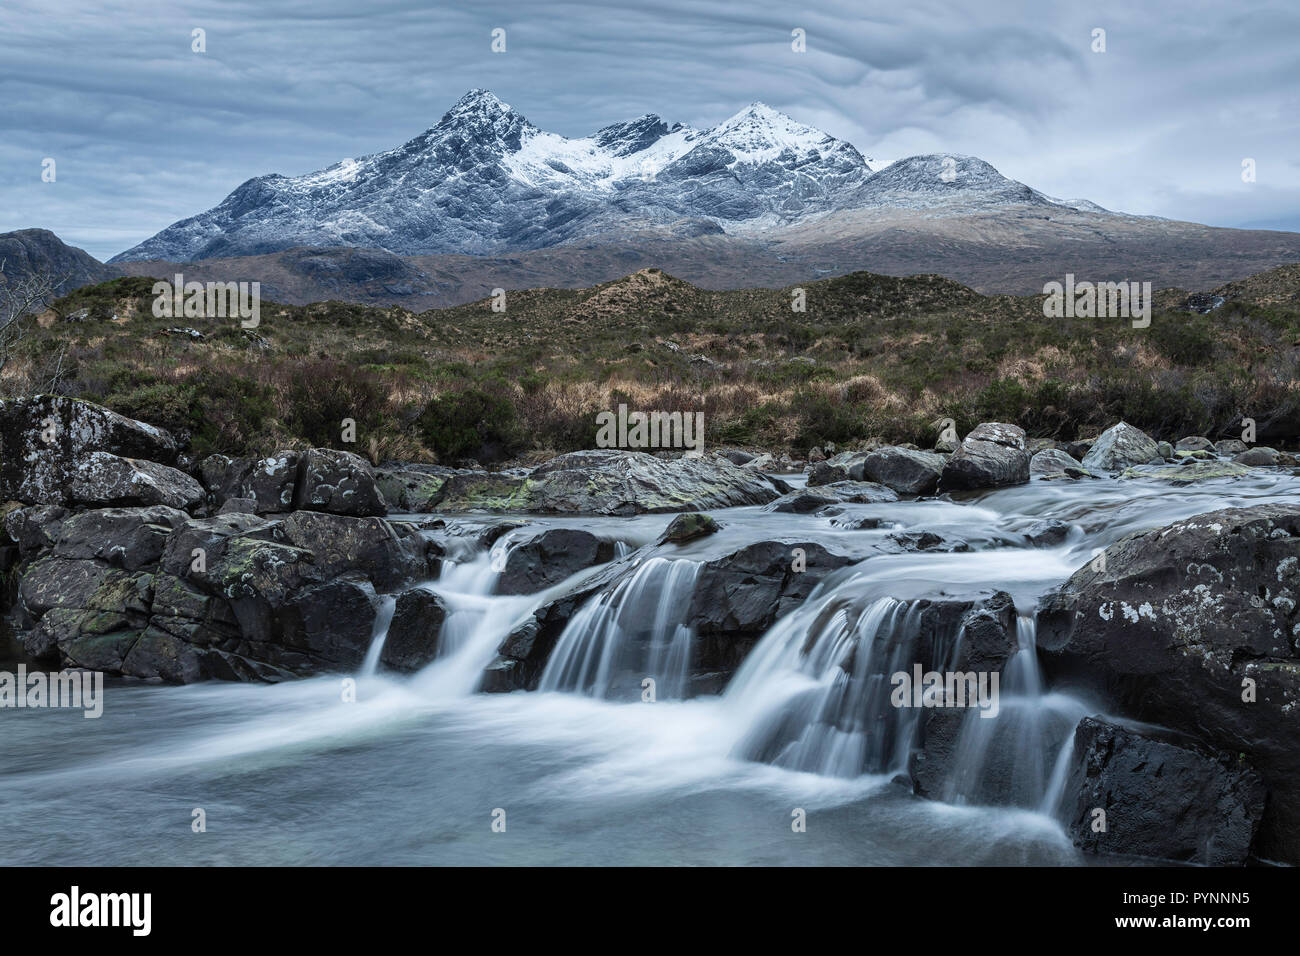 Waterfall with the Black Cuillin mountain, Sligachan, Isle of Skye, Scotland - Stock Image